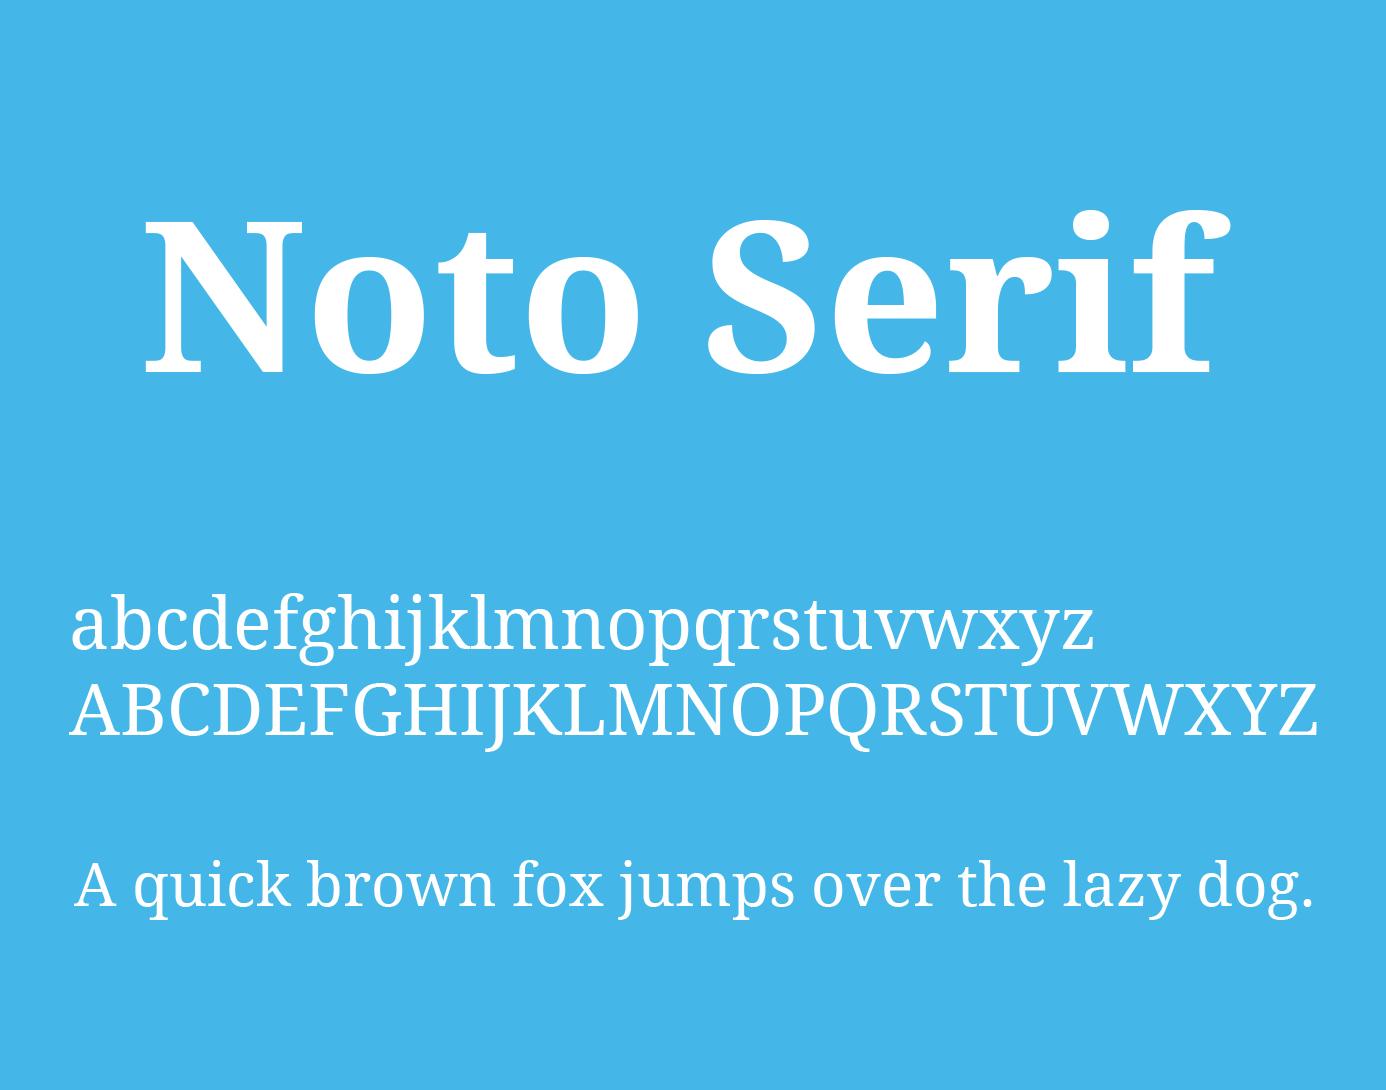 The font Noto Serif.